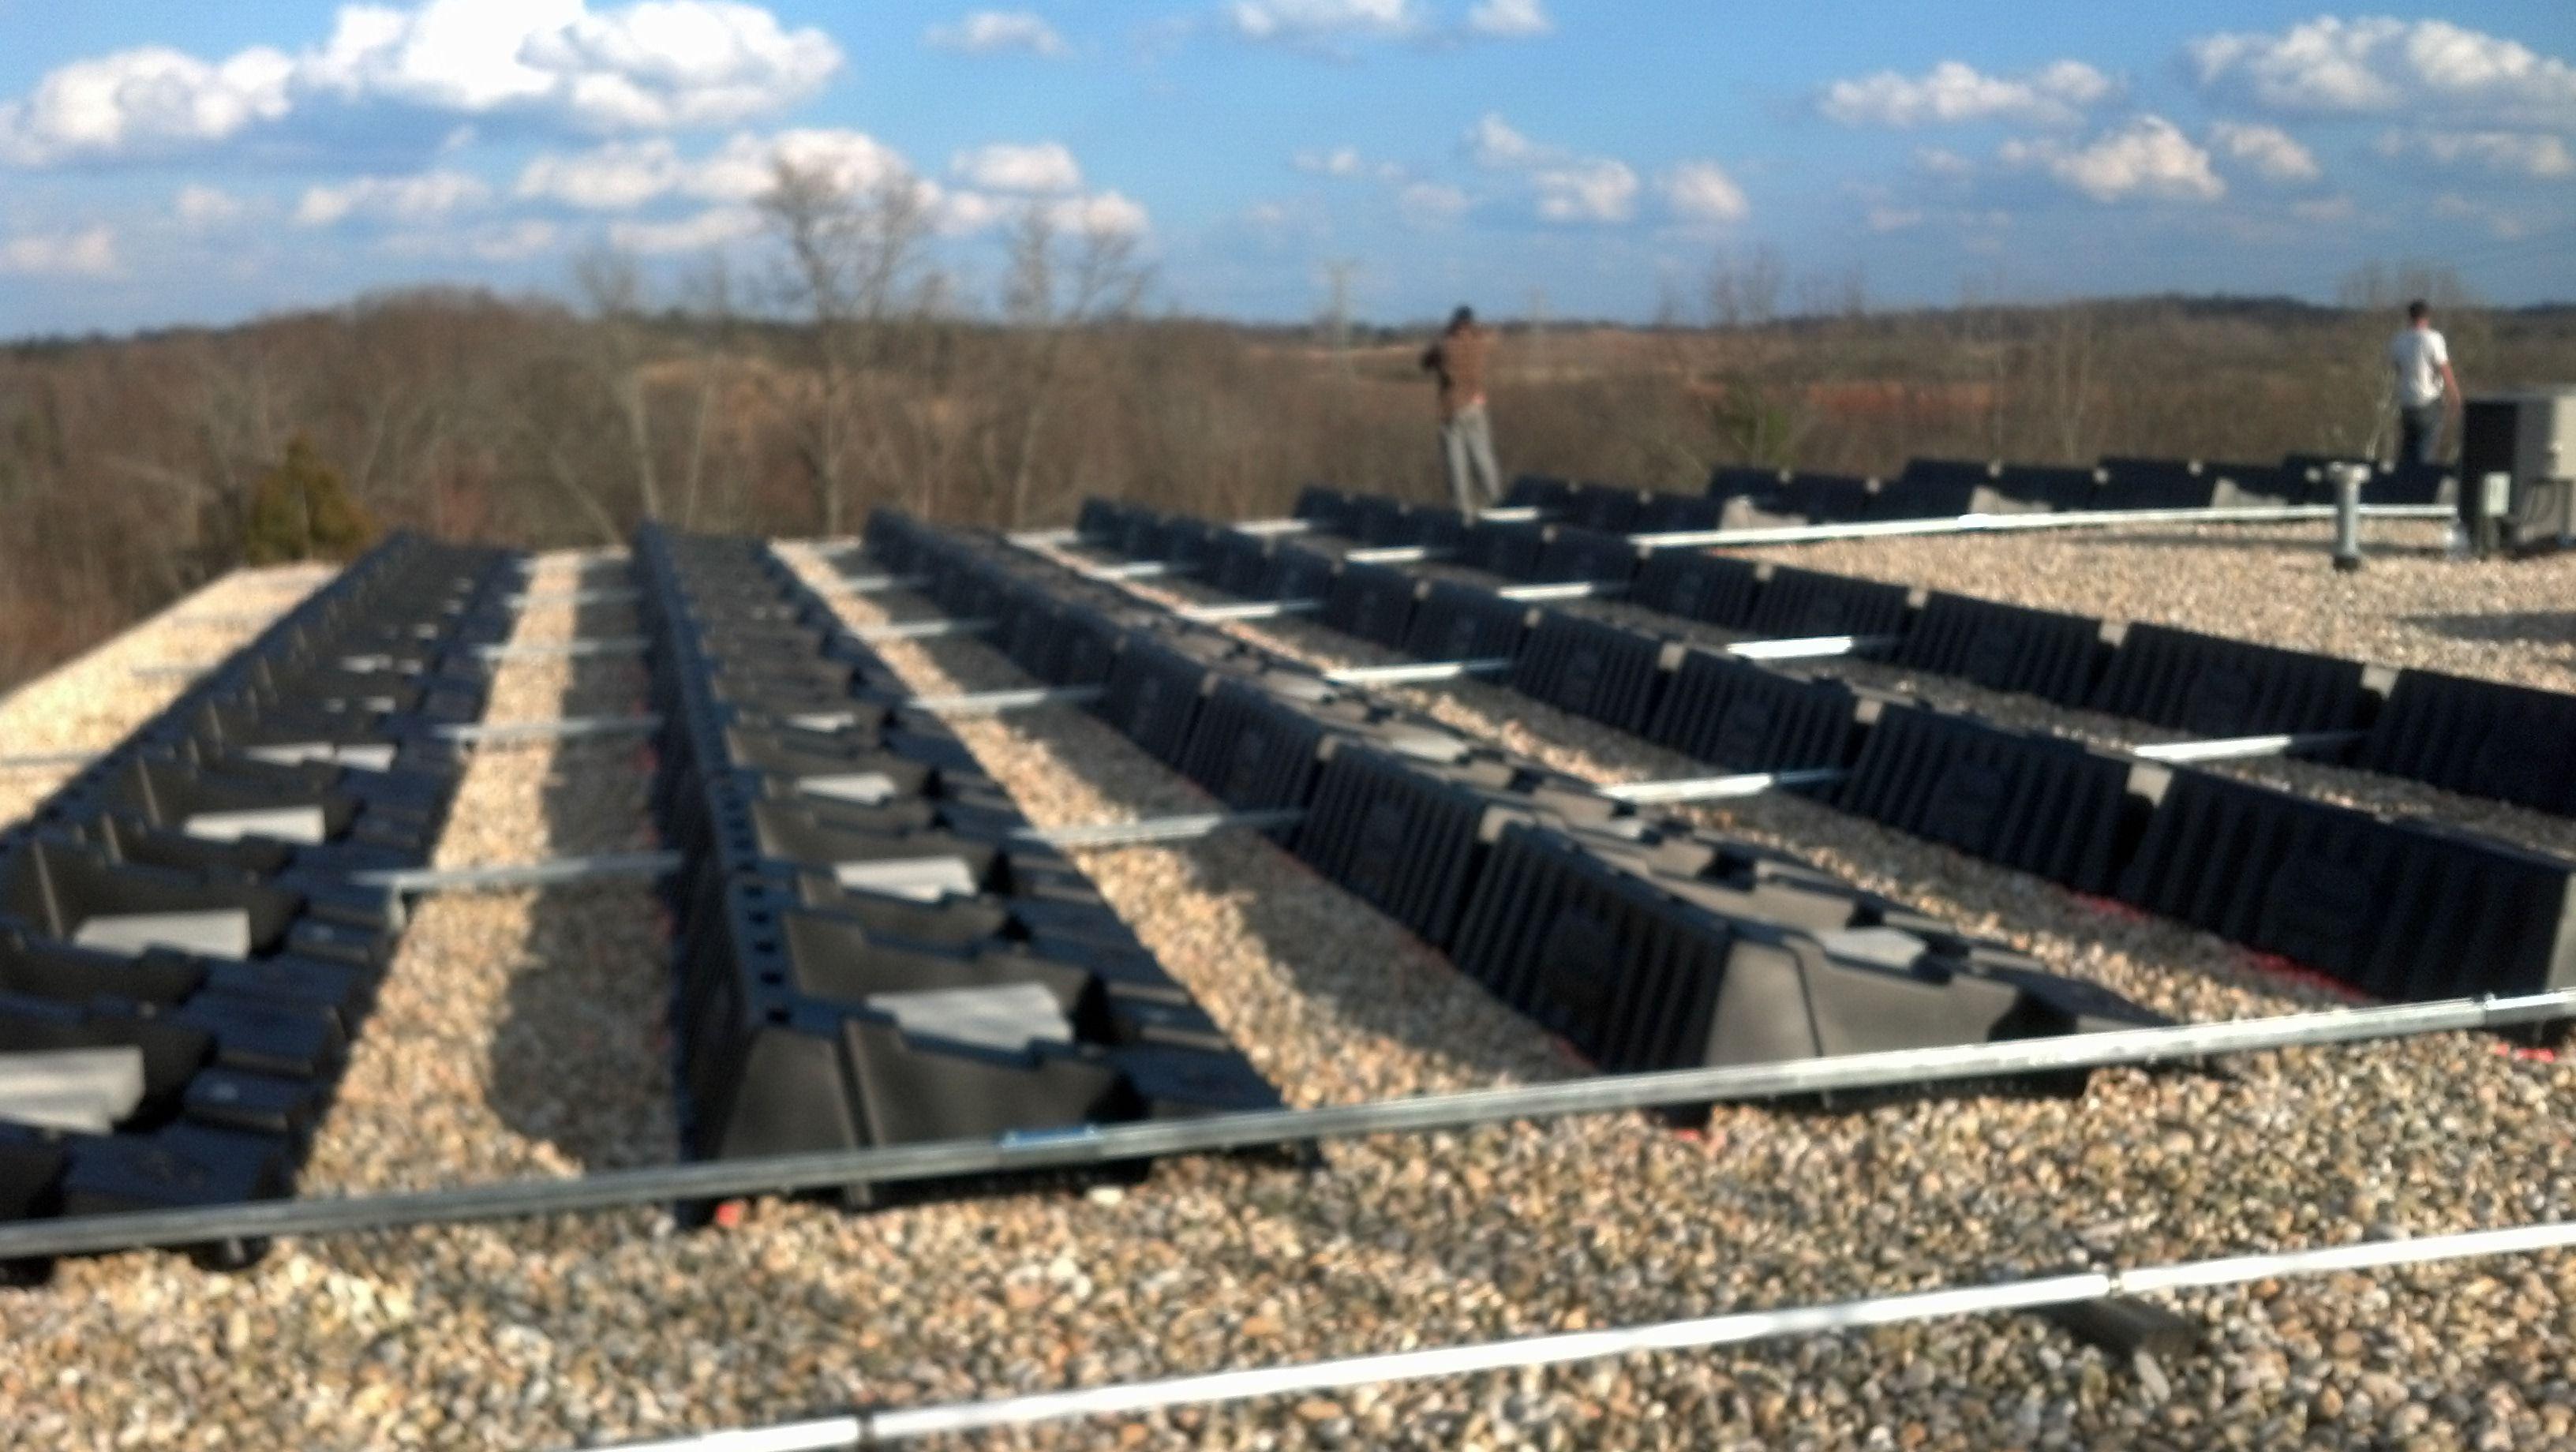 Solar Panel Ballast For Flat Roof Install Works Like A Paper Weight Solar Flat Roof Installation